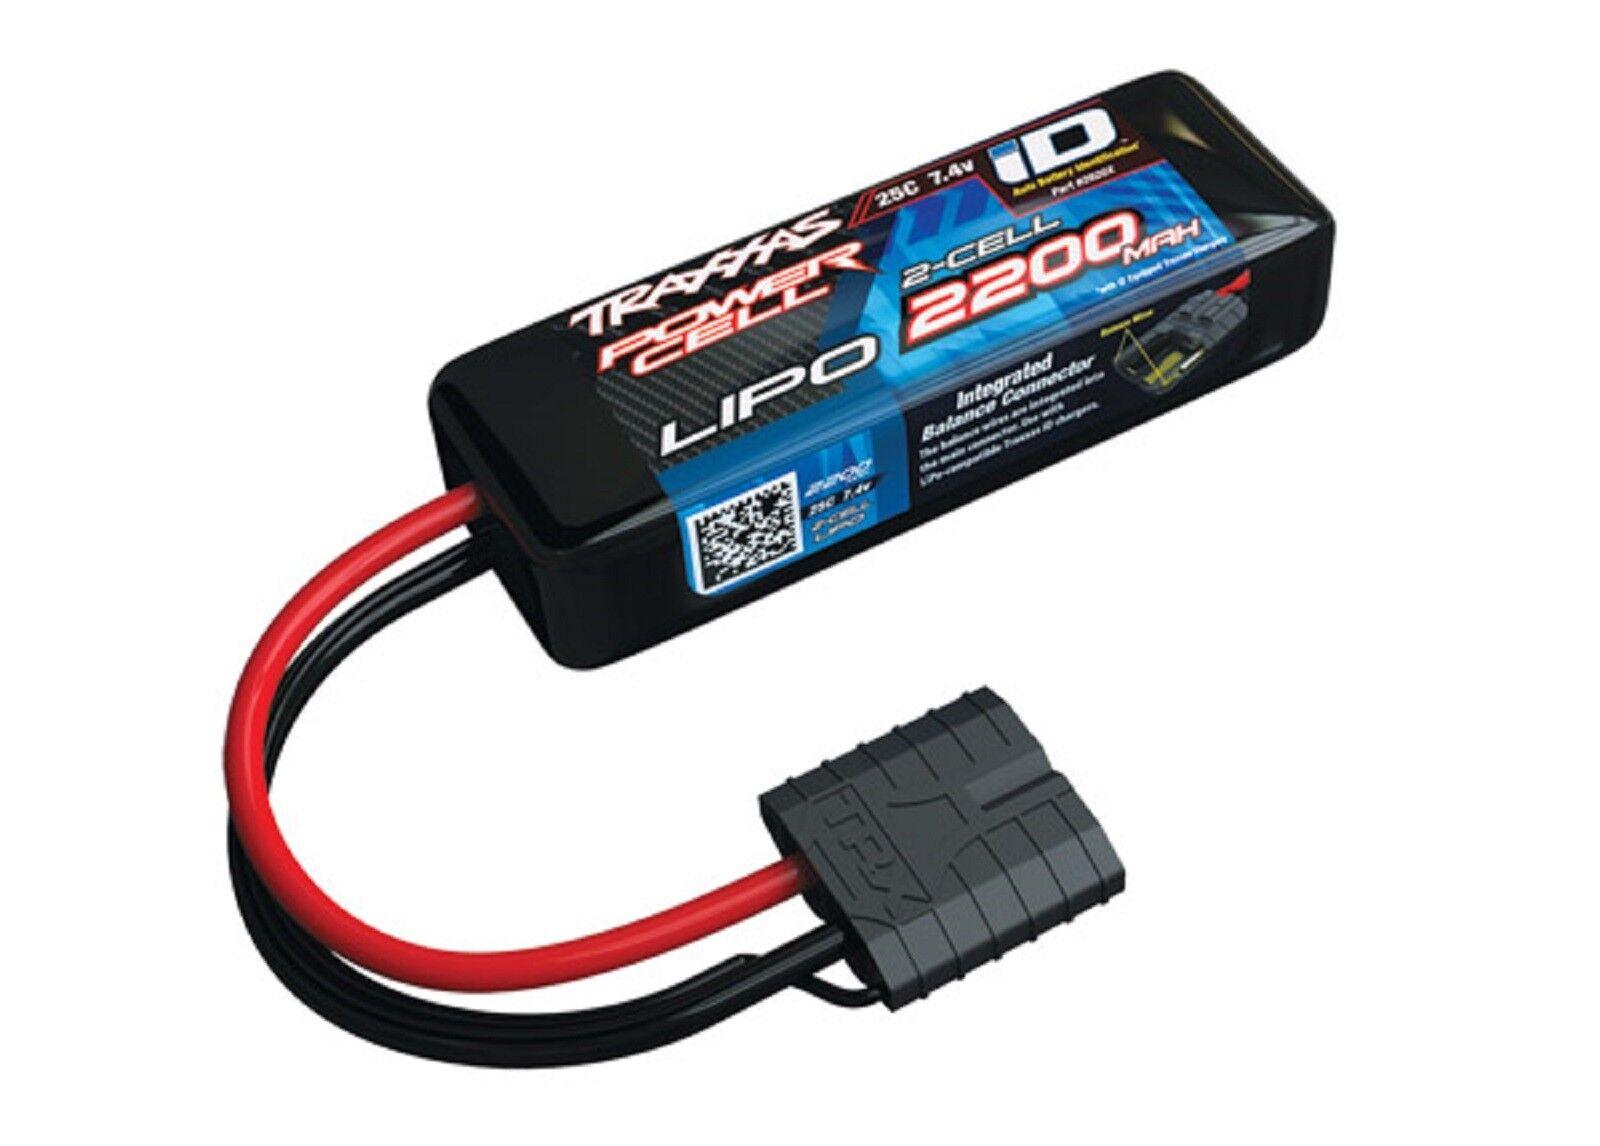 2200mAh 7.4v 2-Cell 25C LiPo Battery by Traxxas TRA2820x